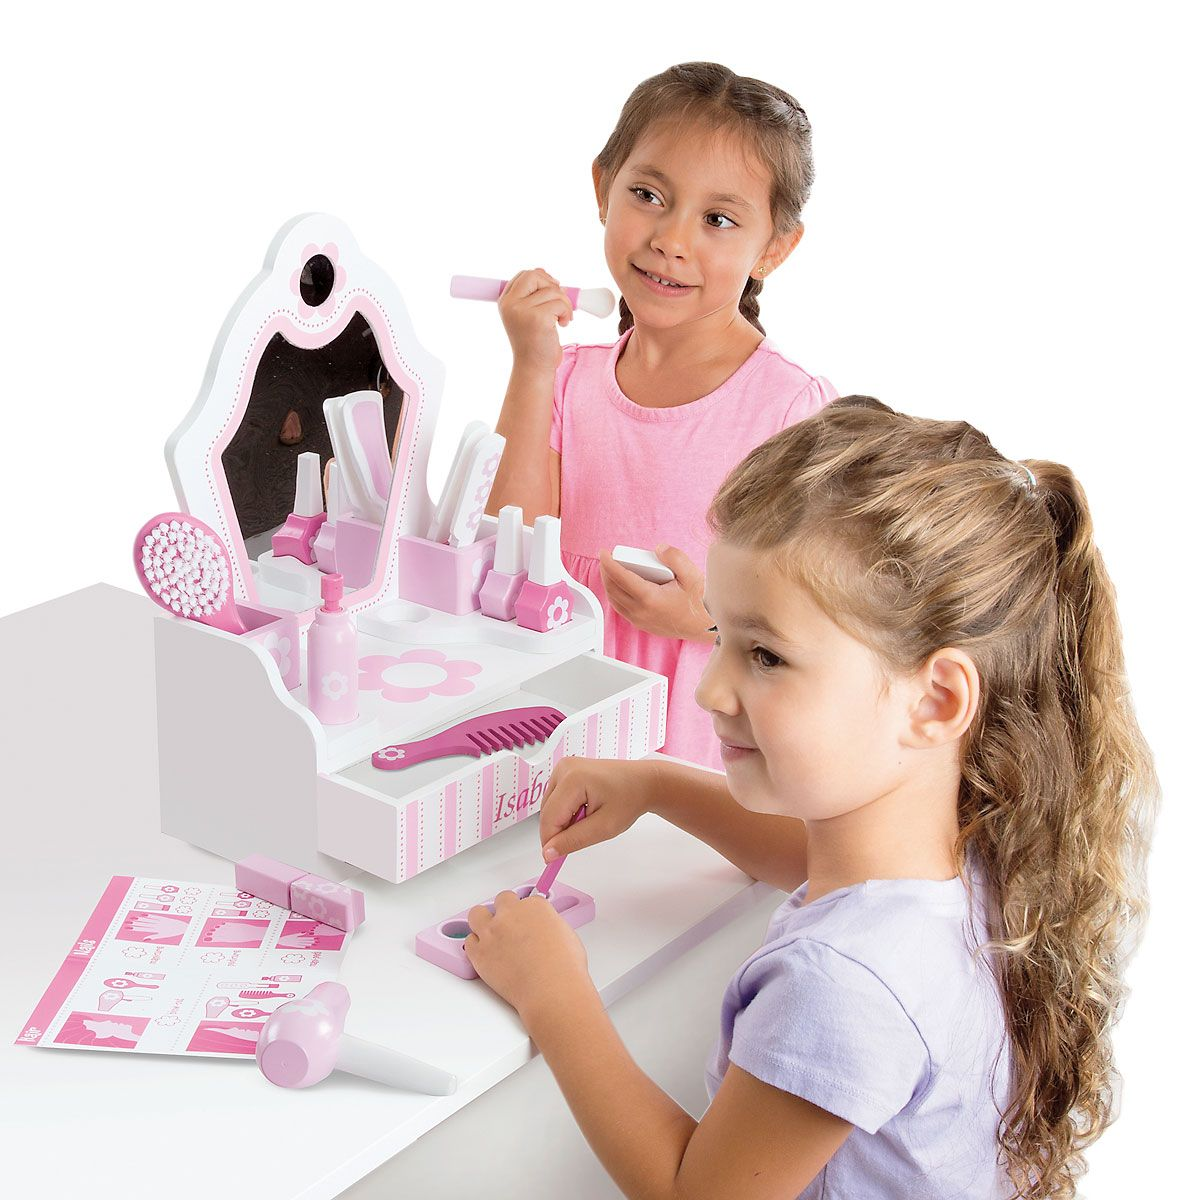 Personalized Salon Playset by Melissa & Doug®